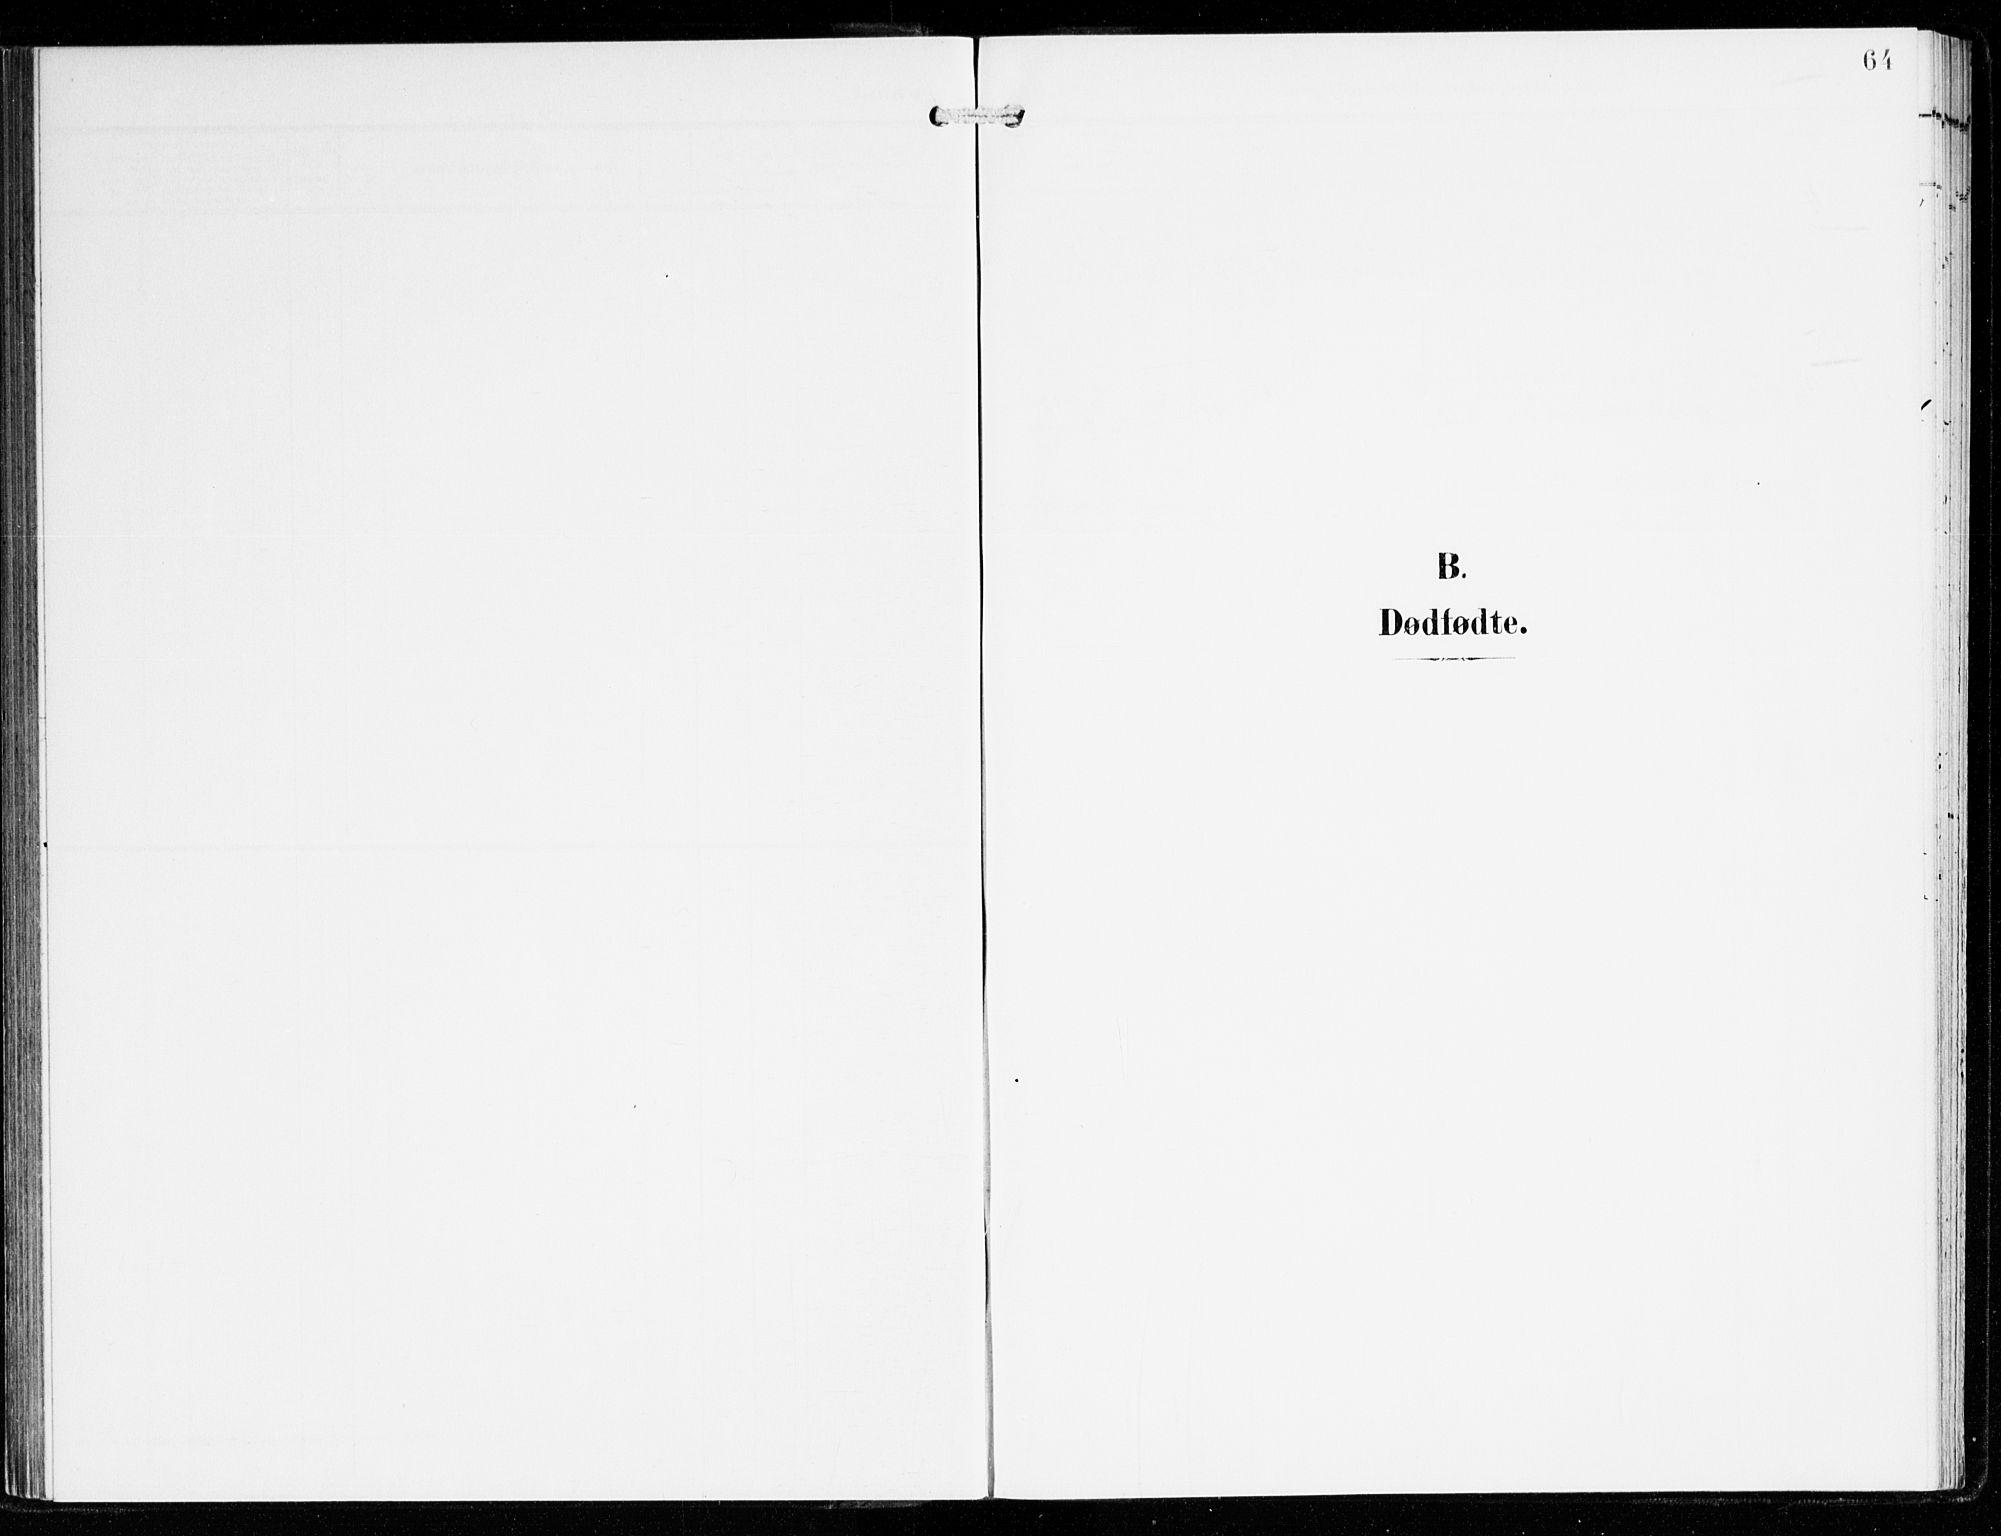 SAB, Hyllestad Sokneprestembete, Ministerialbok nr. B 2, 1903-1917, s. 64